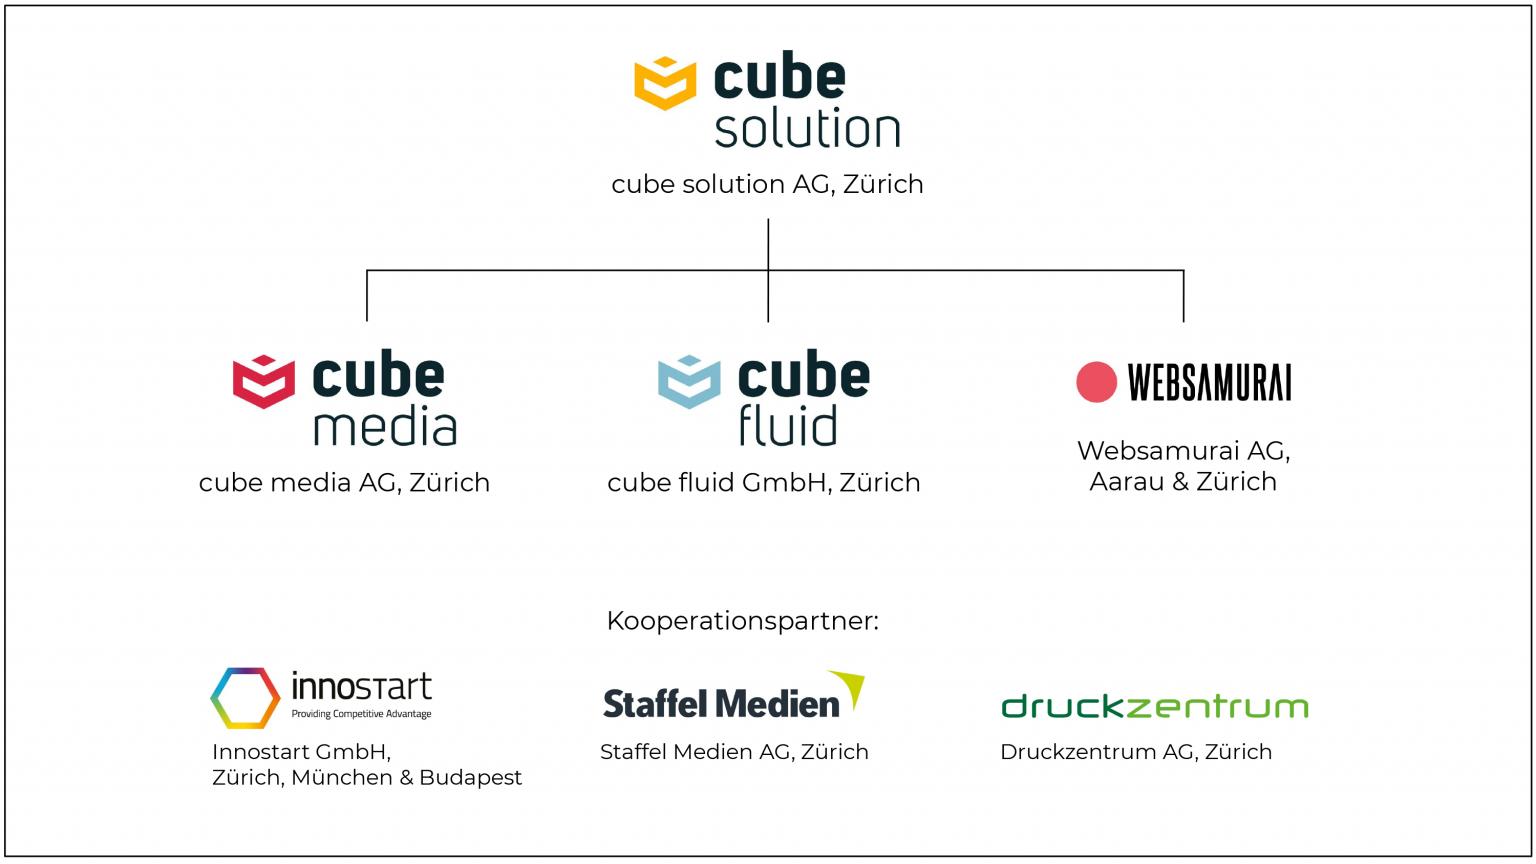 organigramm - cube media AG